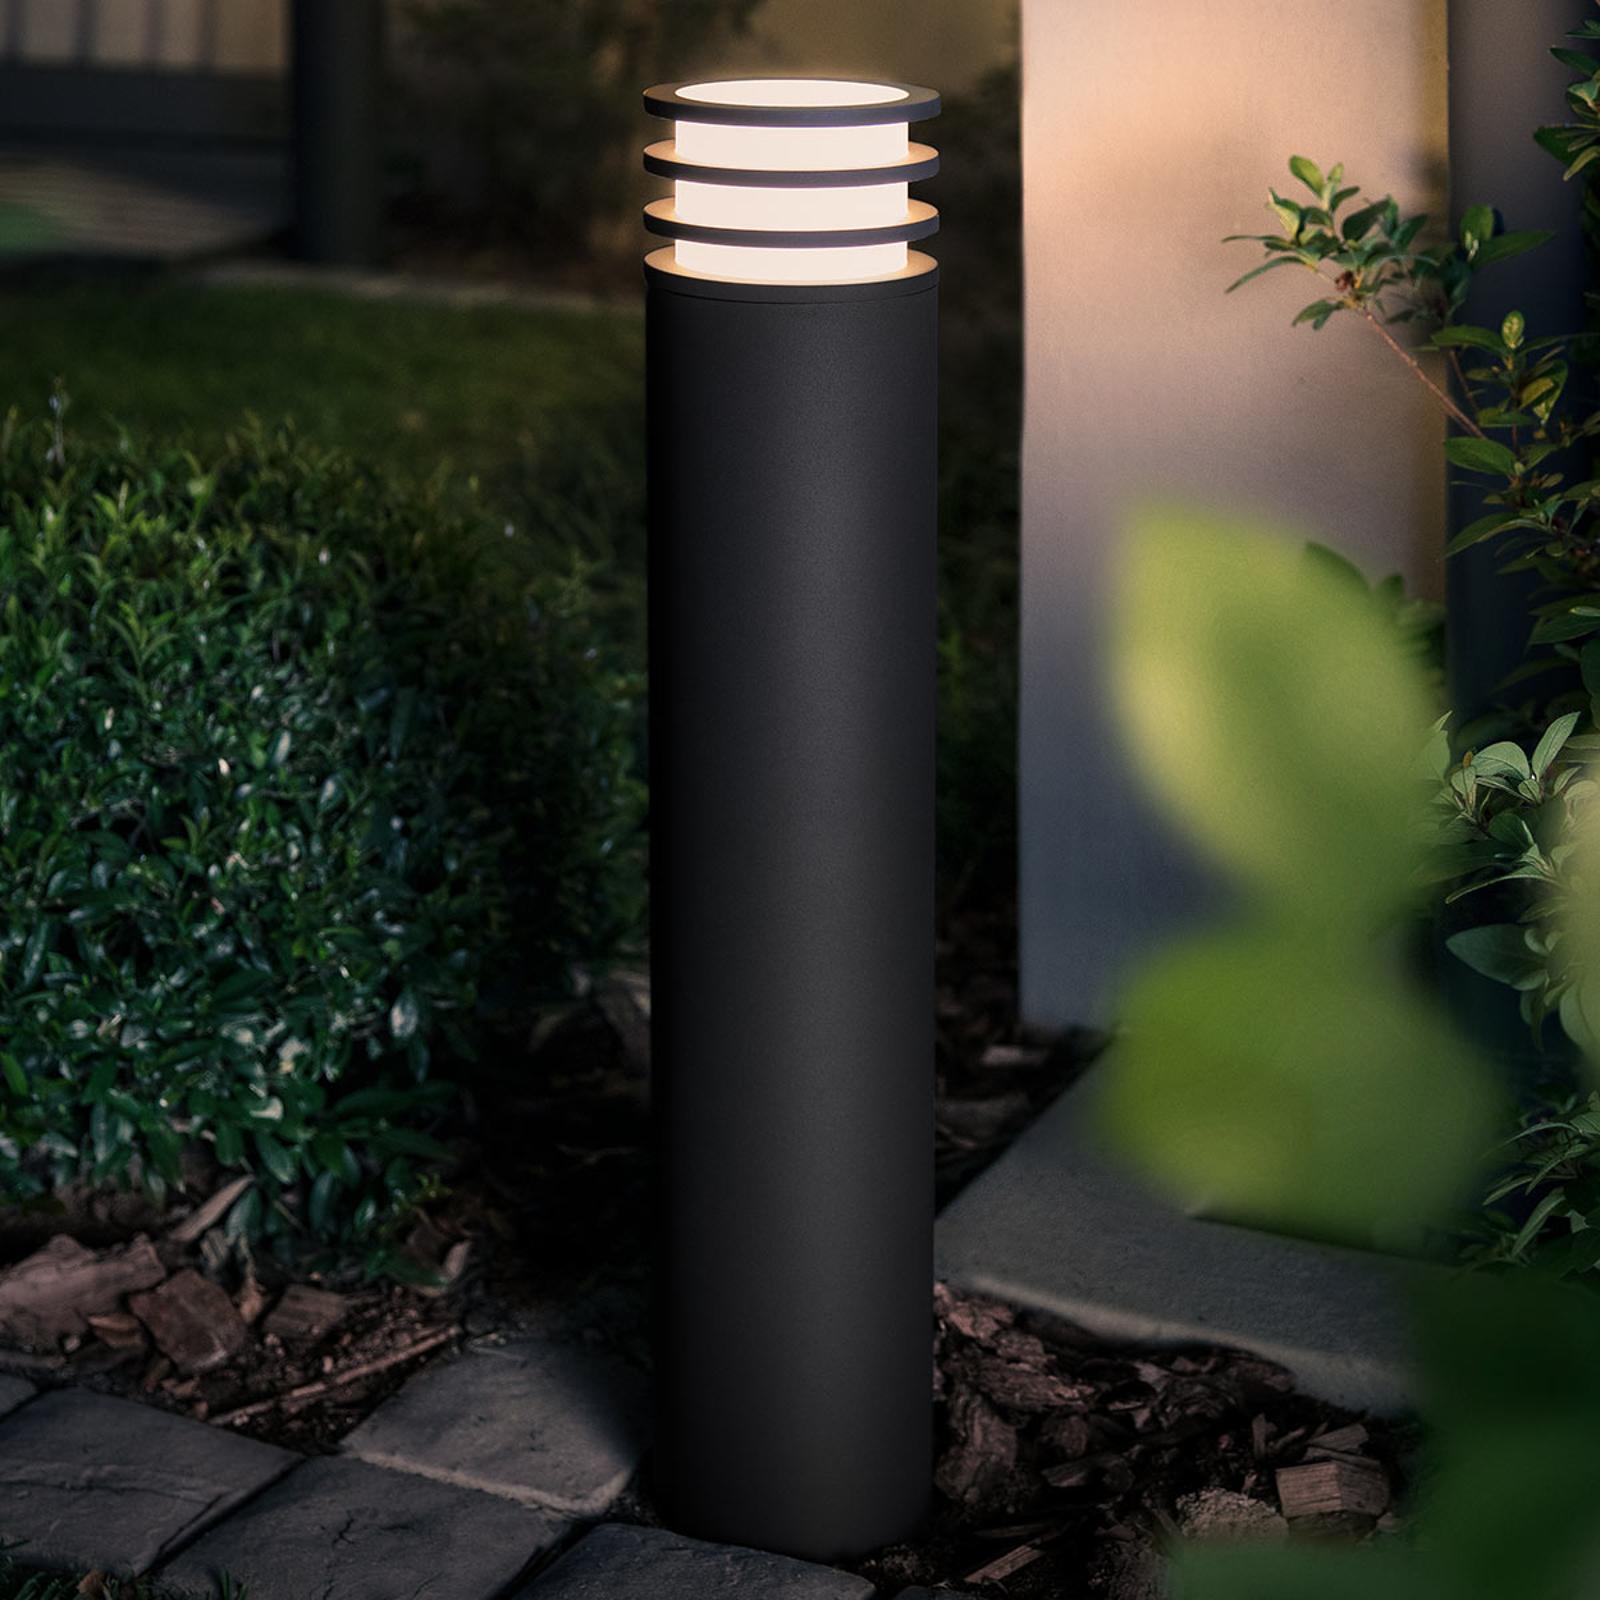 Philips Hue słupek oświetleniowy LED Lucca